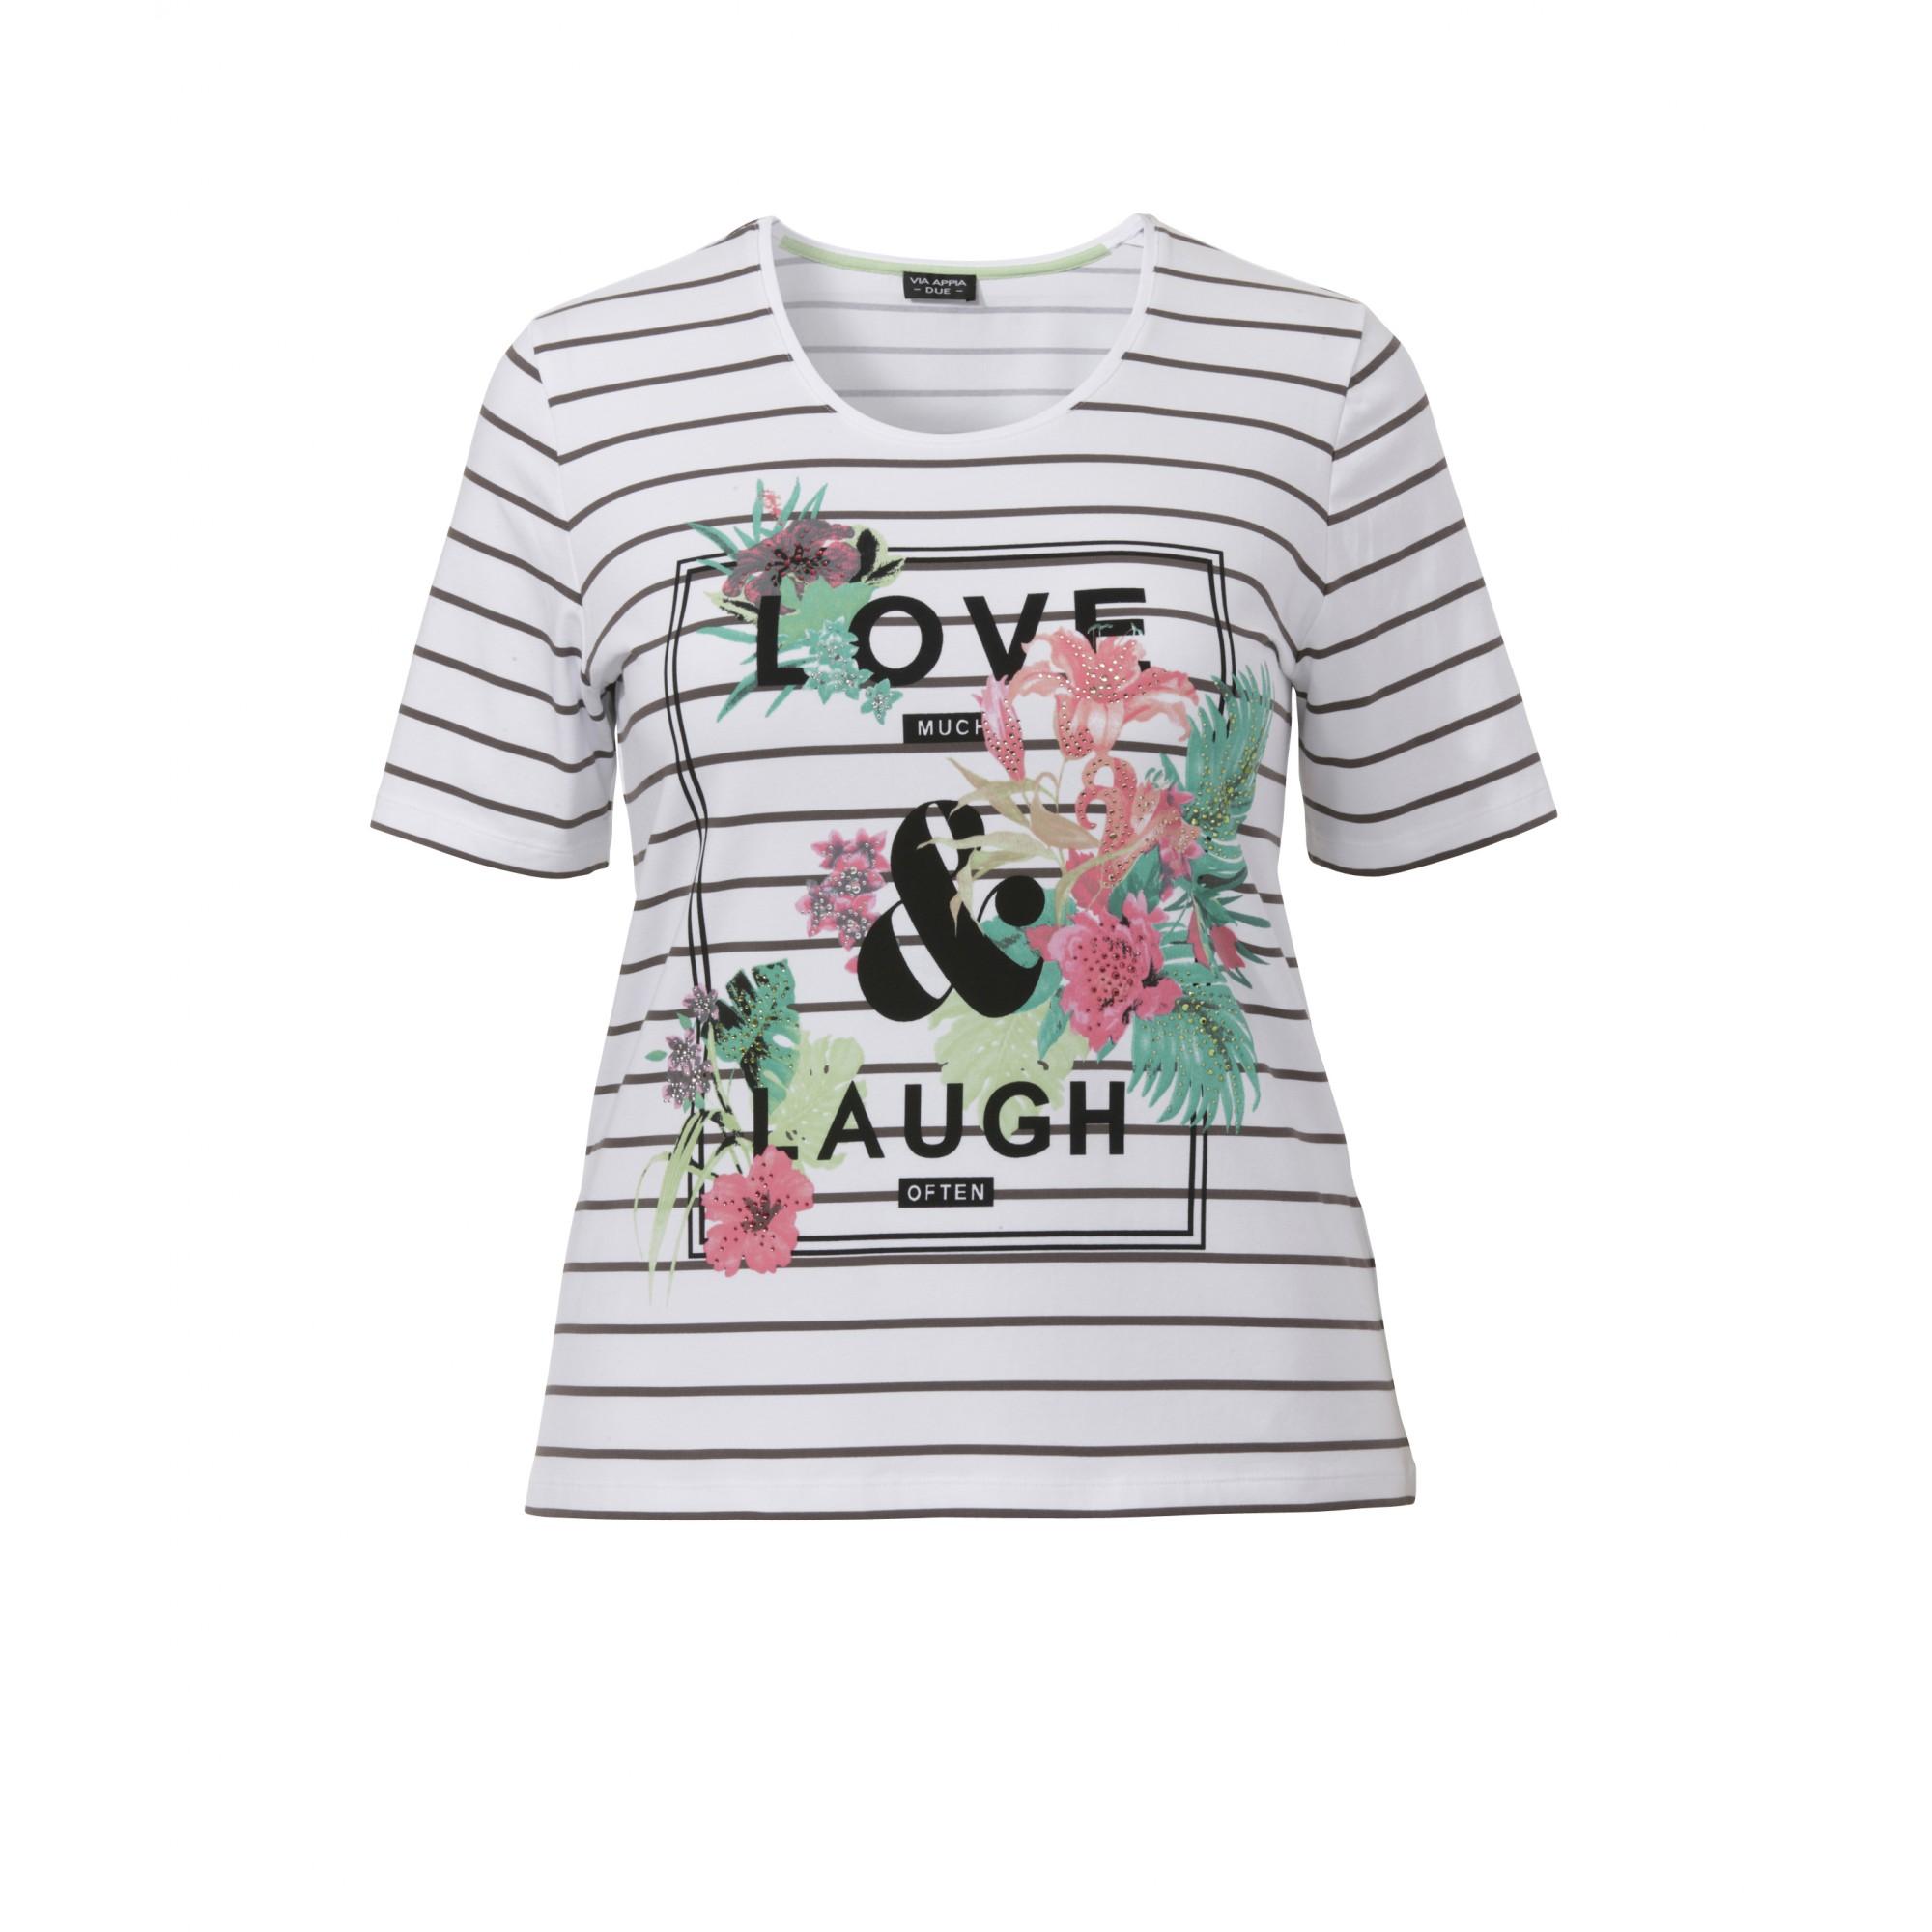 Geringeltes Print T-Shirt ´´Love & Lough´´